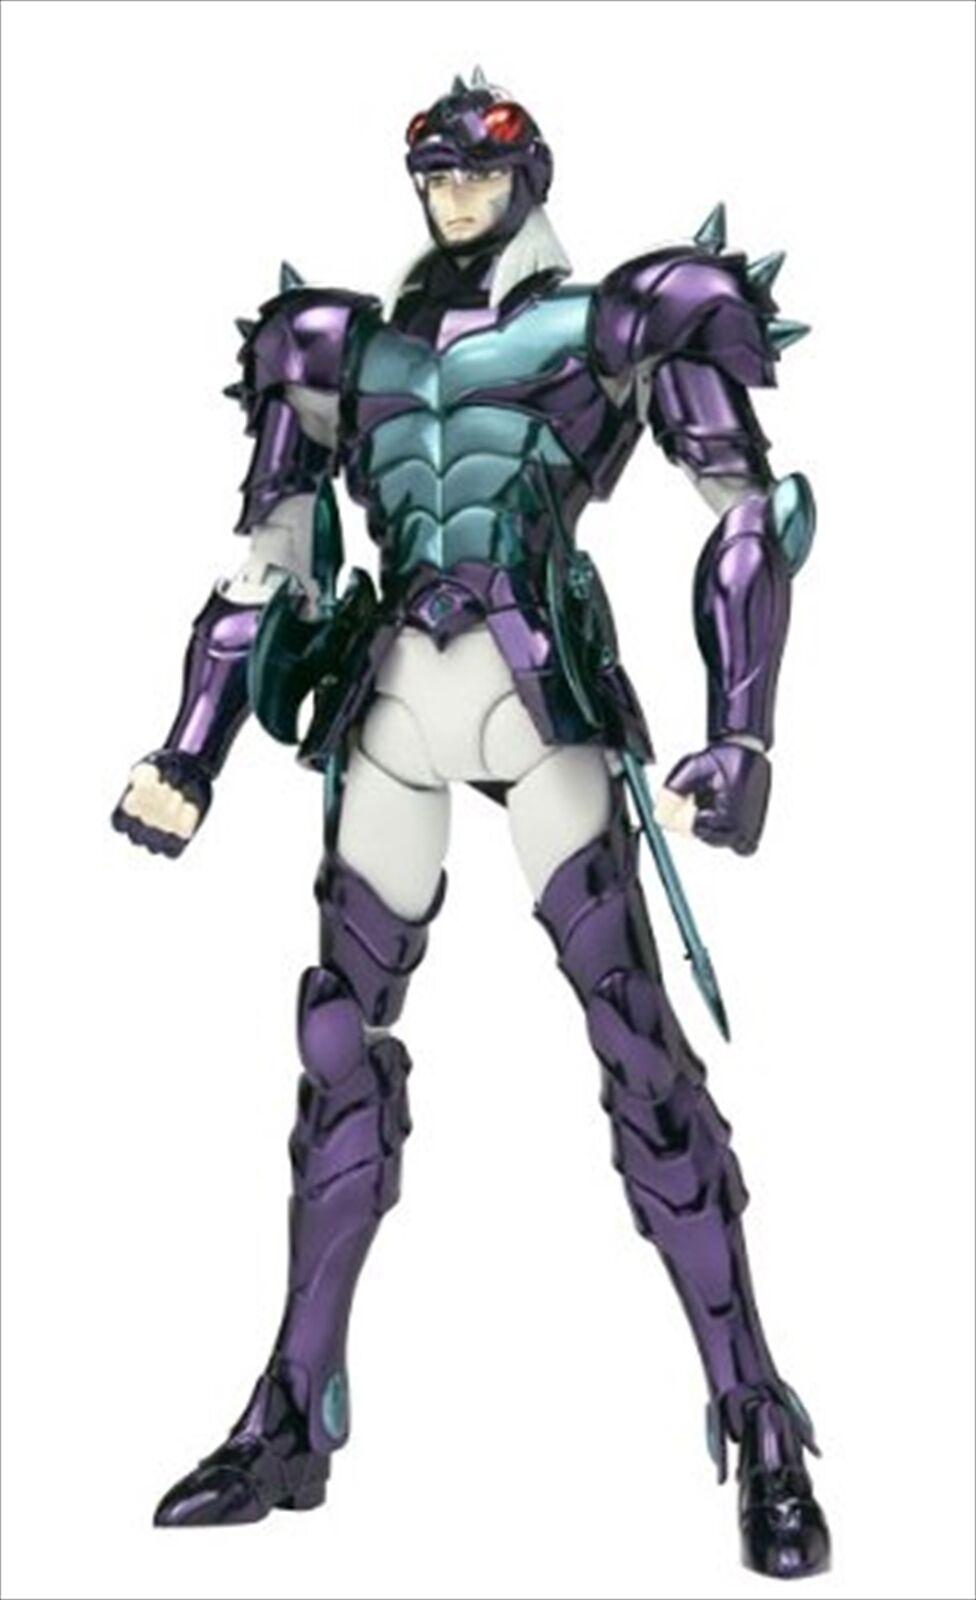 Bandai Saint Seiya Cloth Myth Asgard Gamma Phecda Thor Action Figure